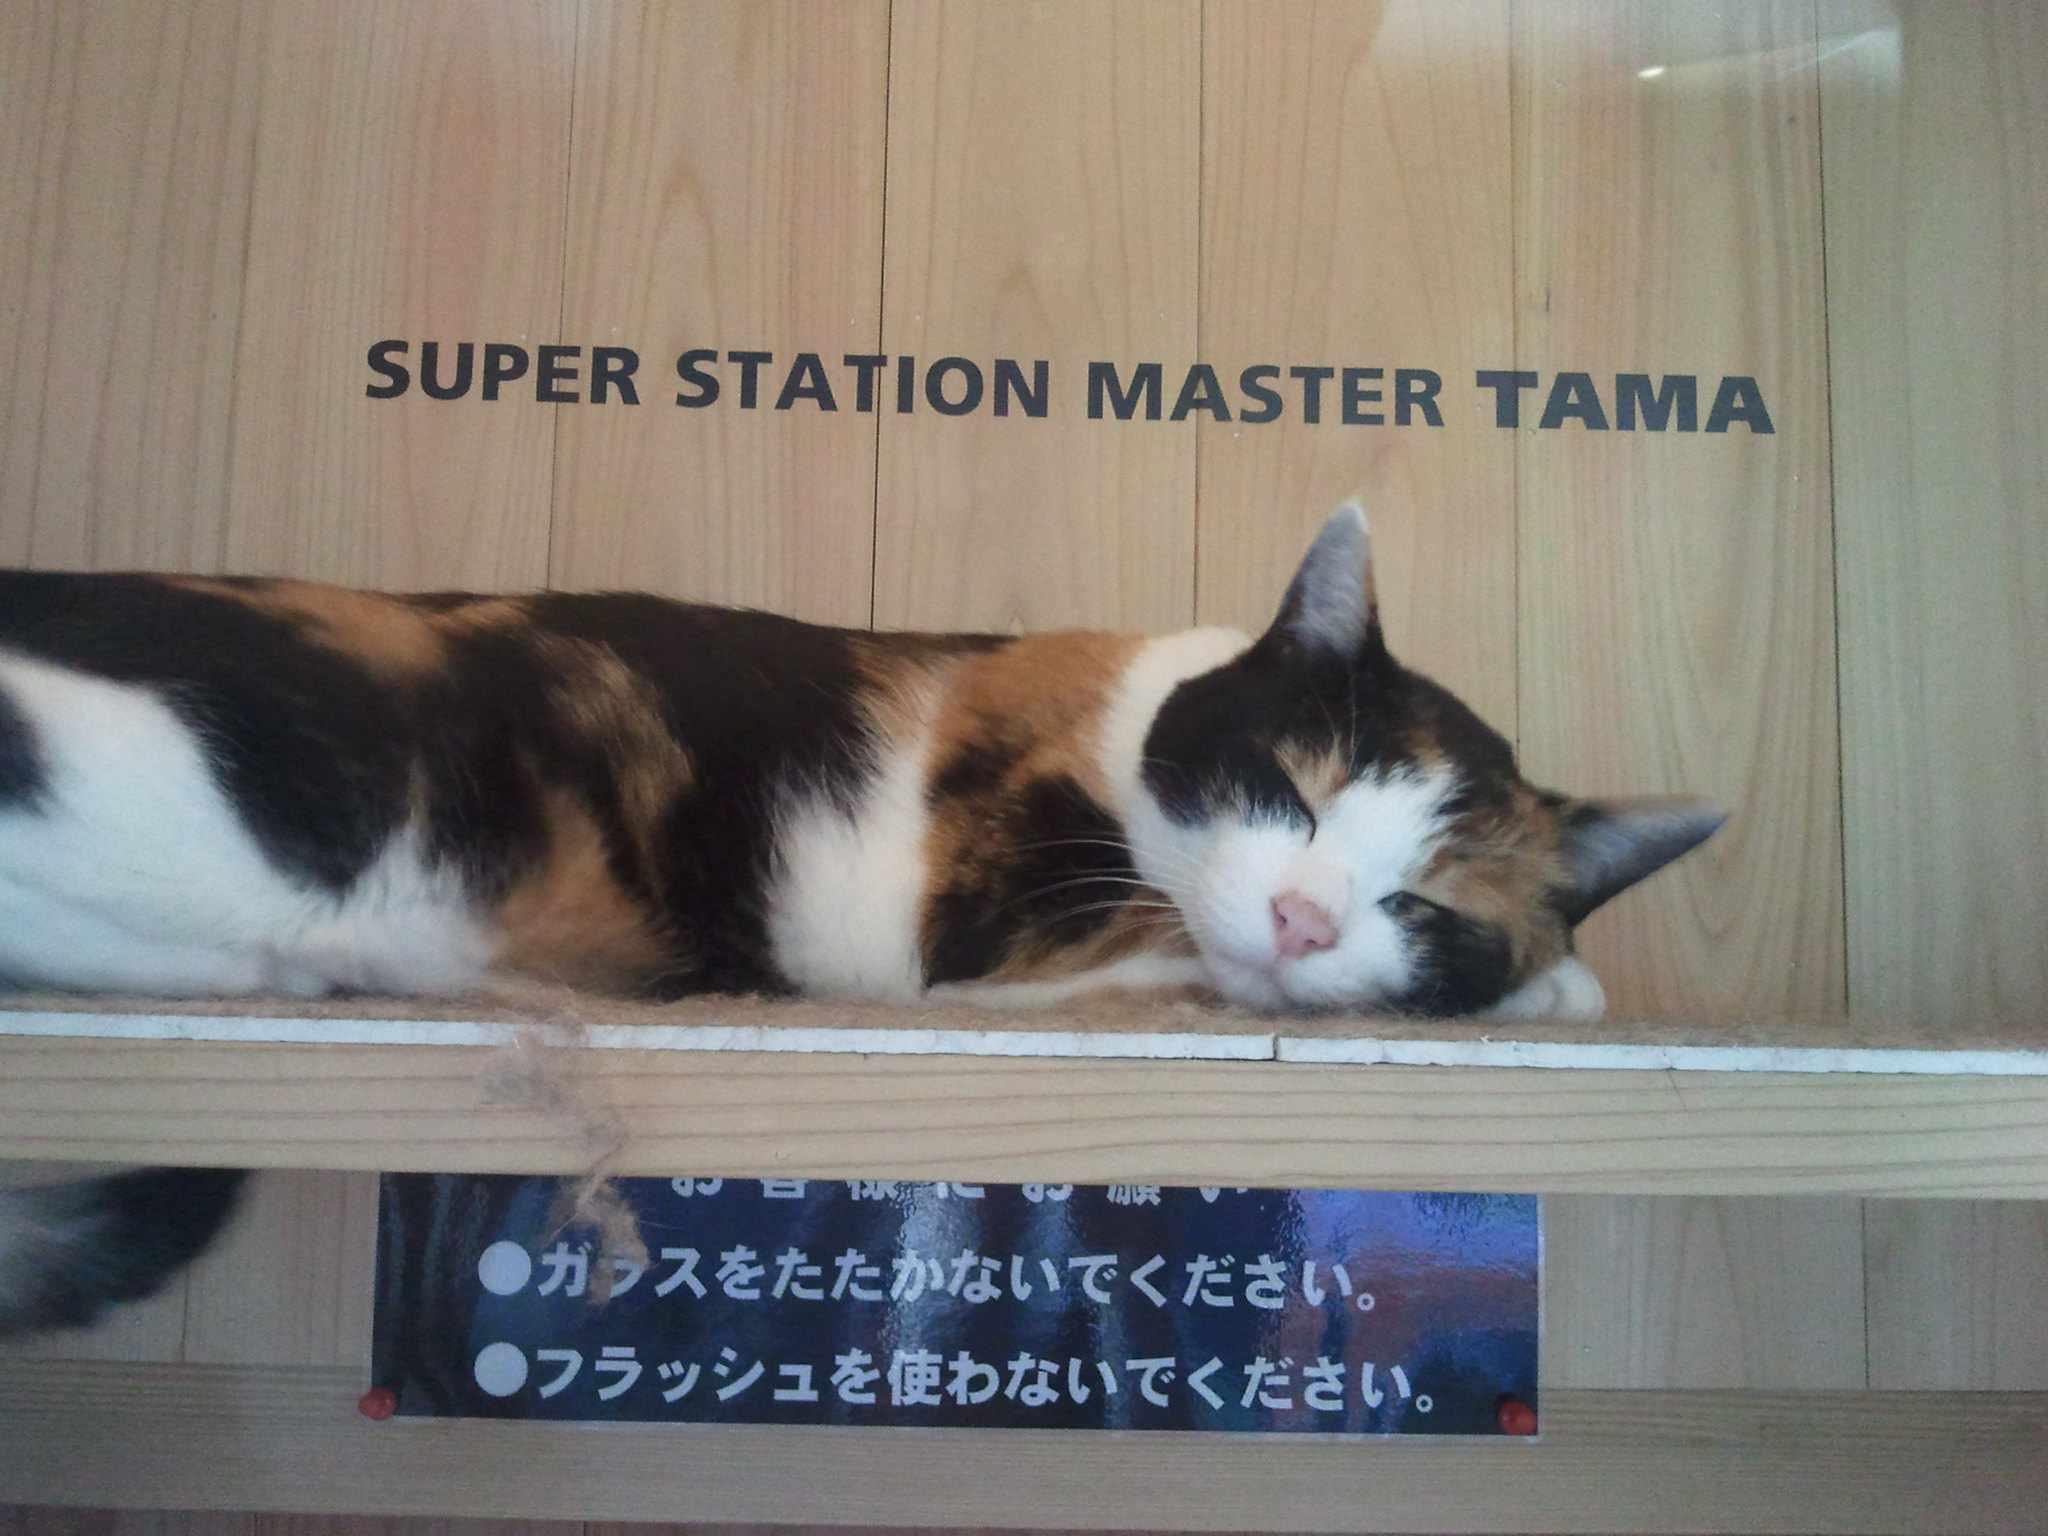 calico cat sleeping in window